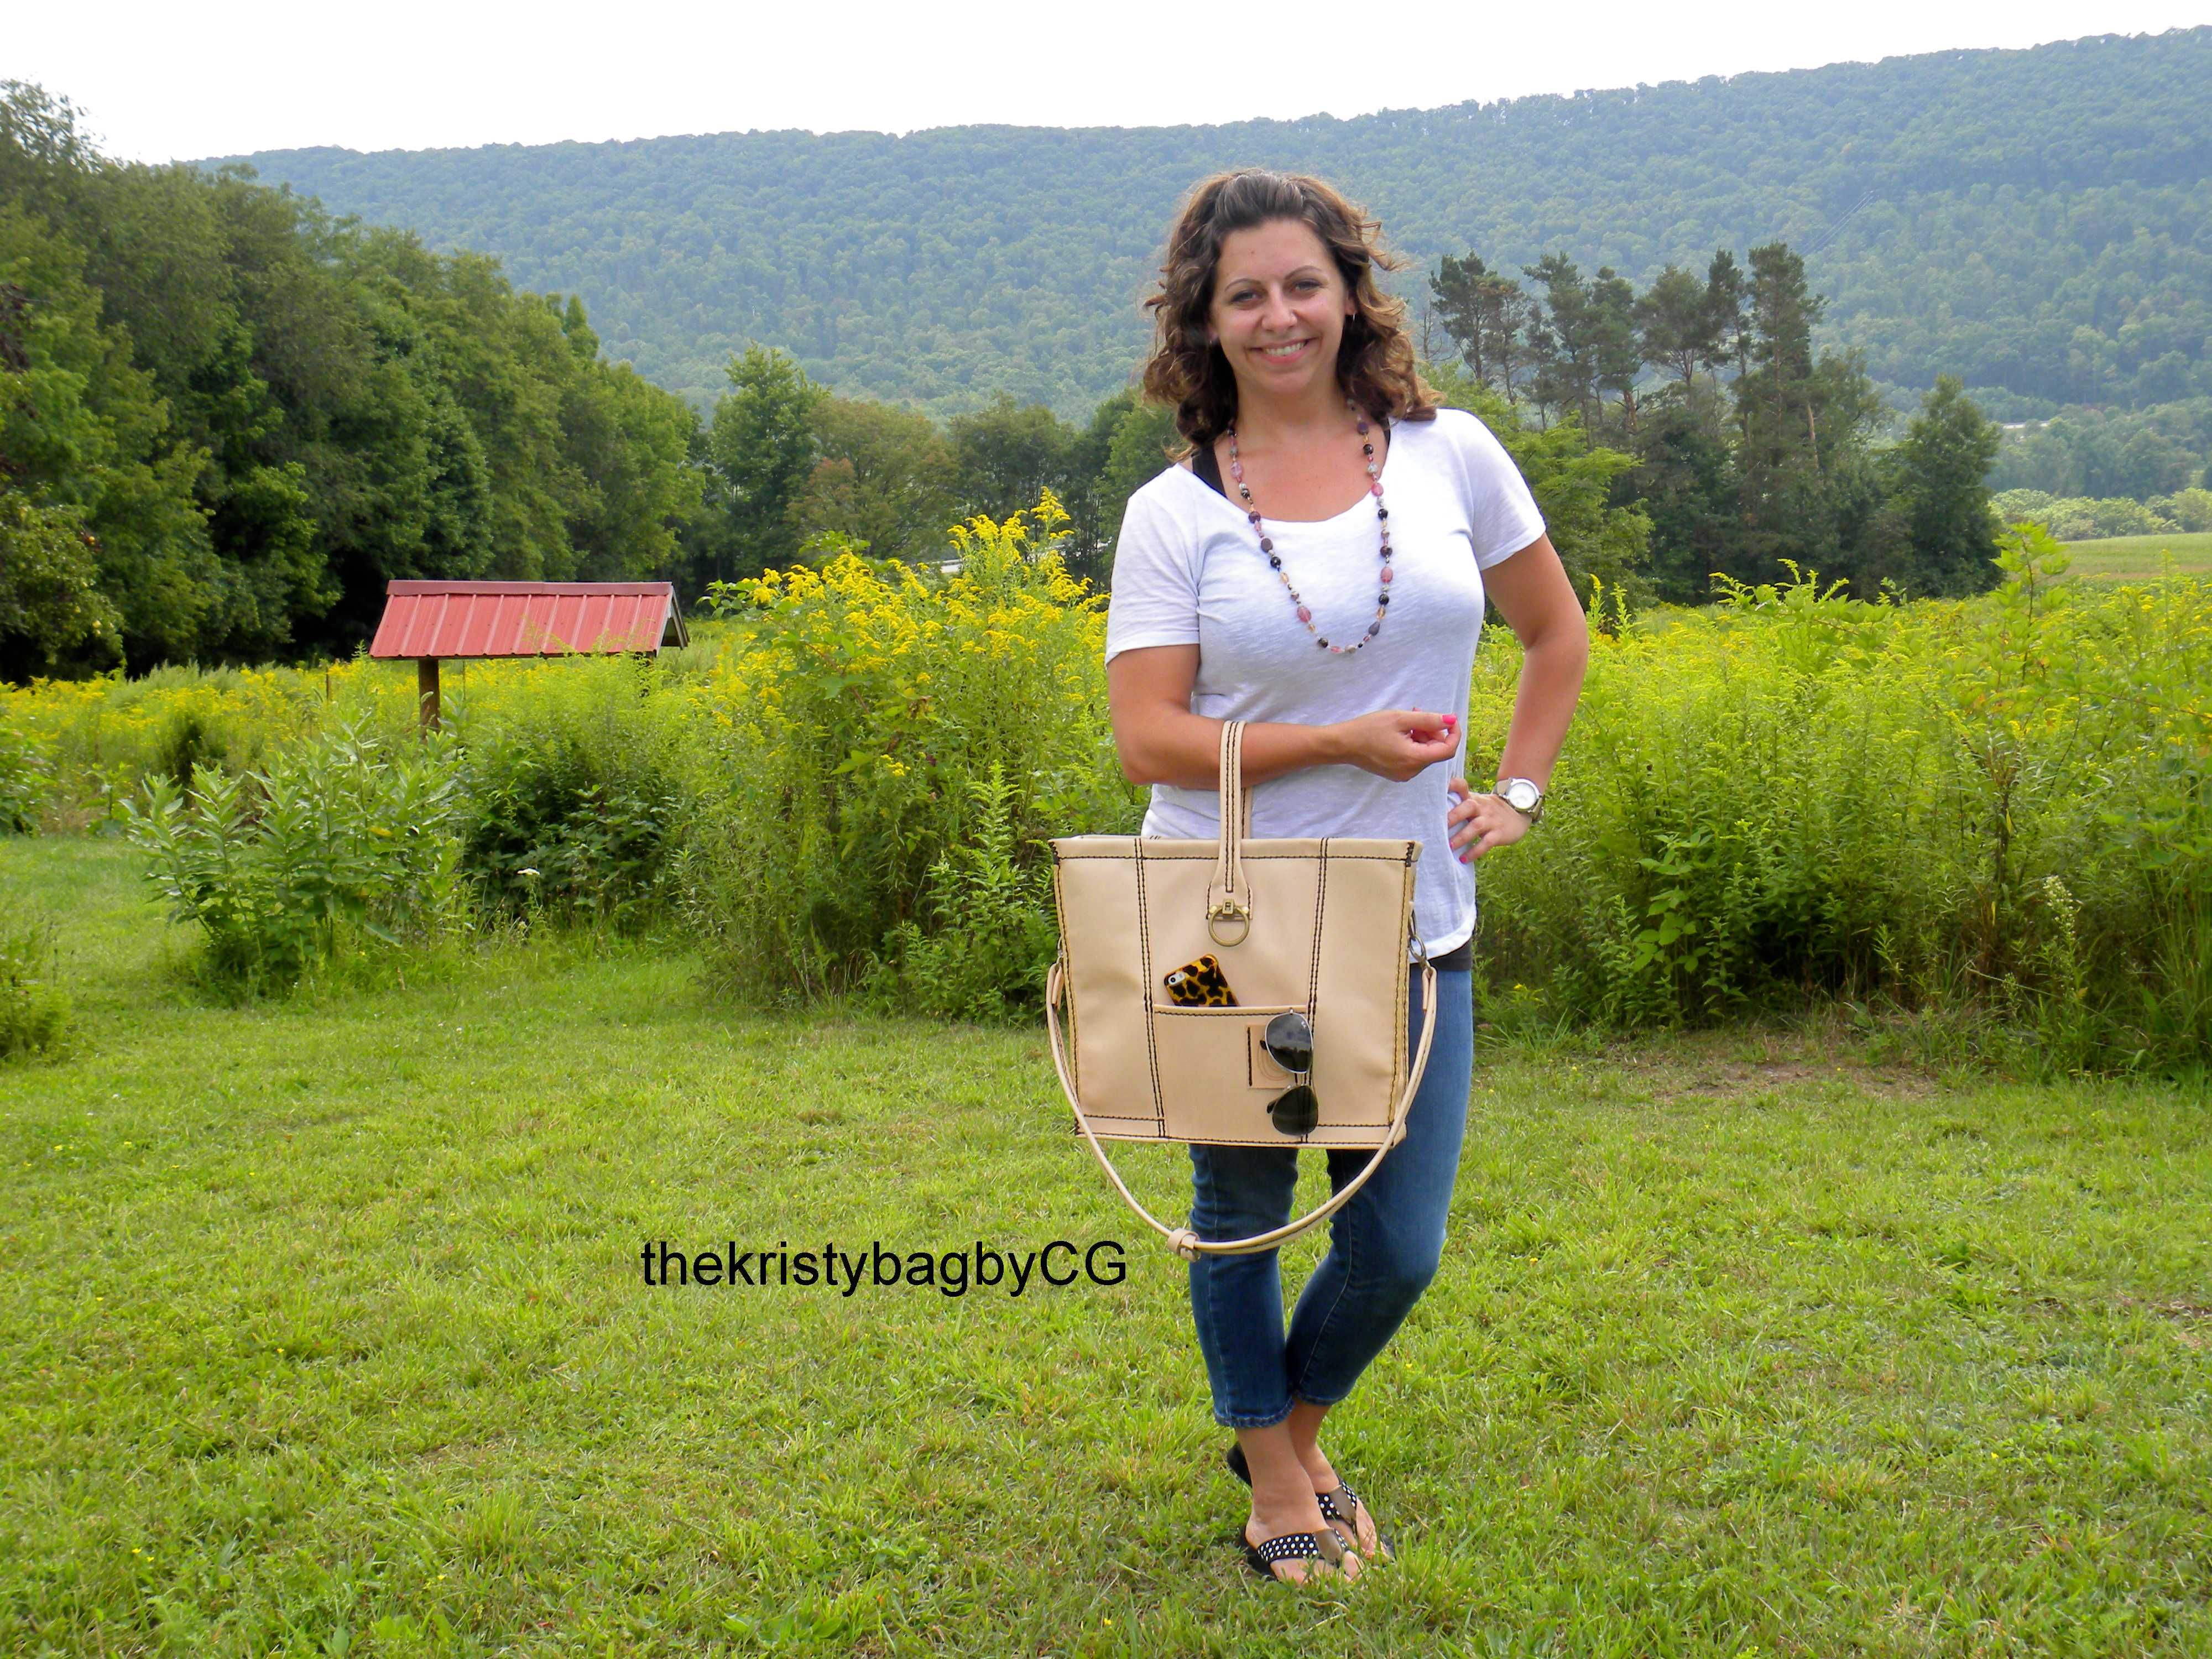 Trend setting handbag designer Kristy Lash  Handbag Hottie strikes a pose with tote bag in goldenrod field at Crabtree Gardens The Kristy Bag by CG